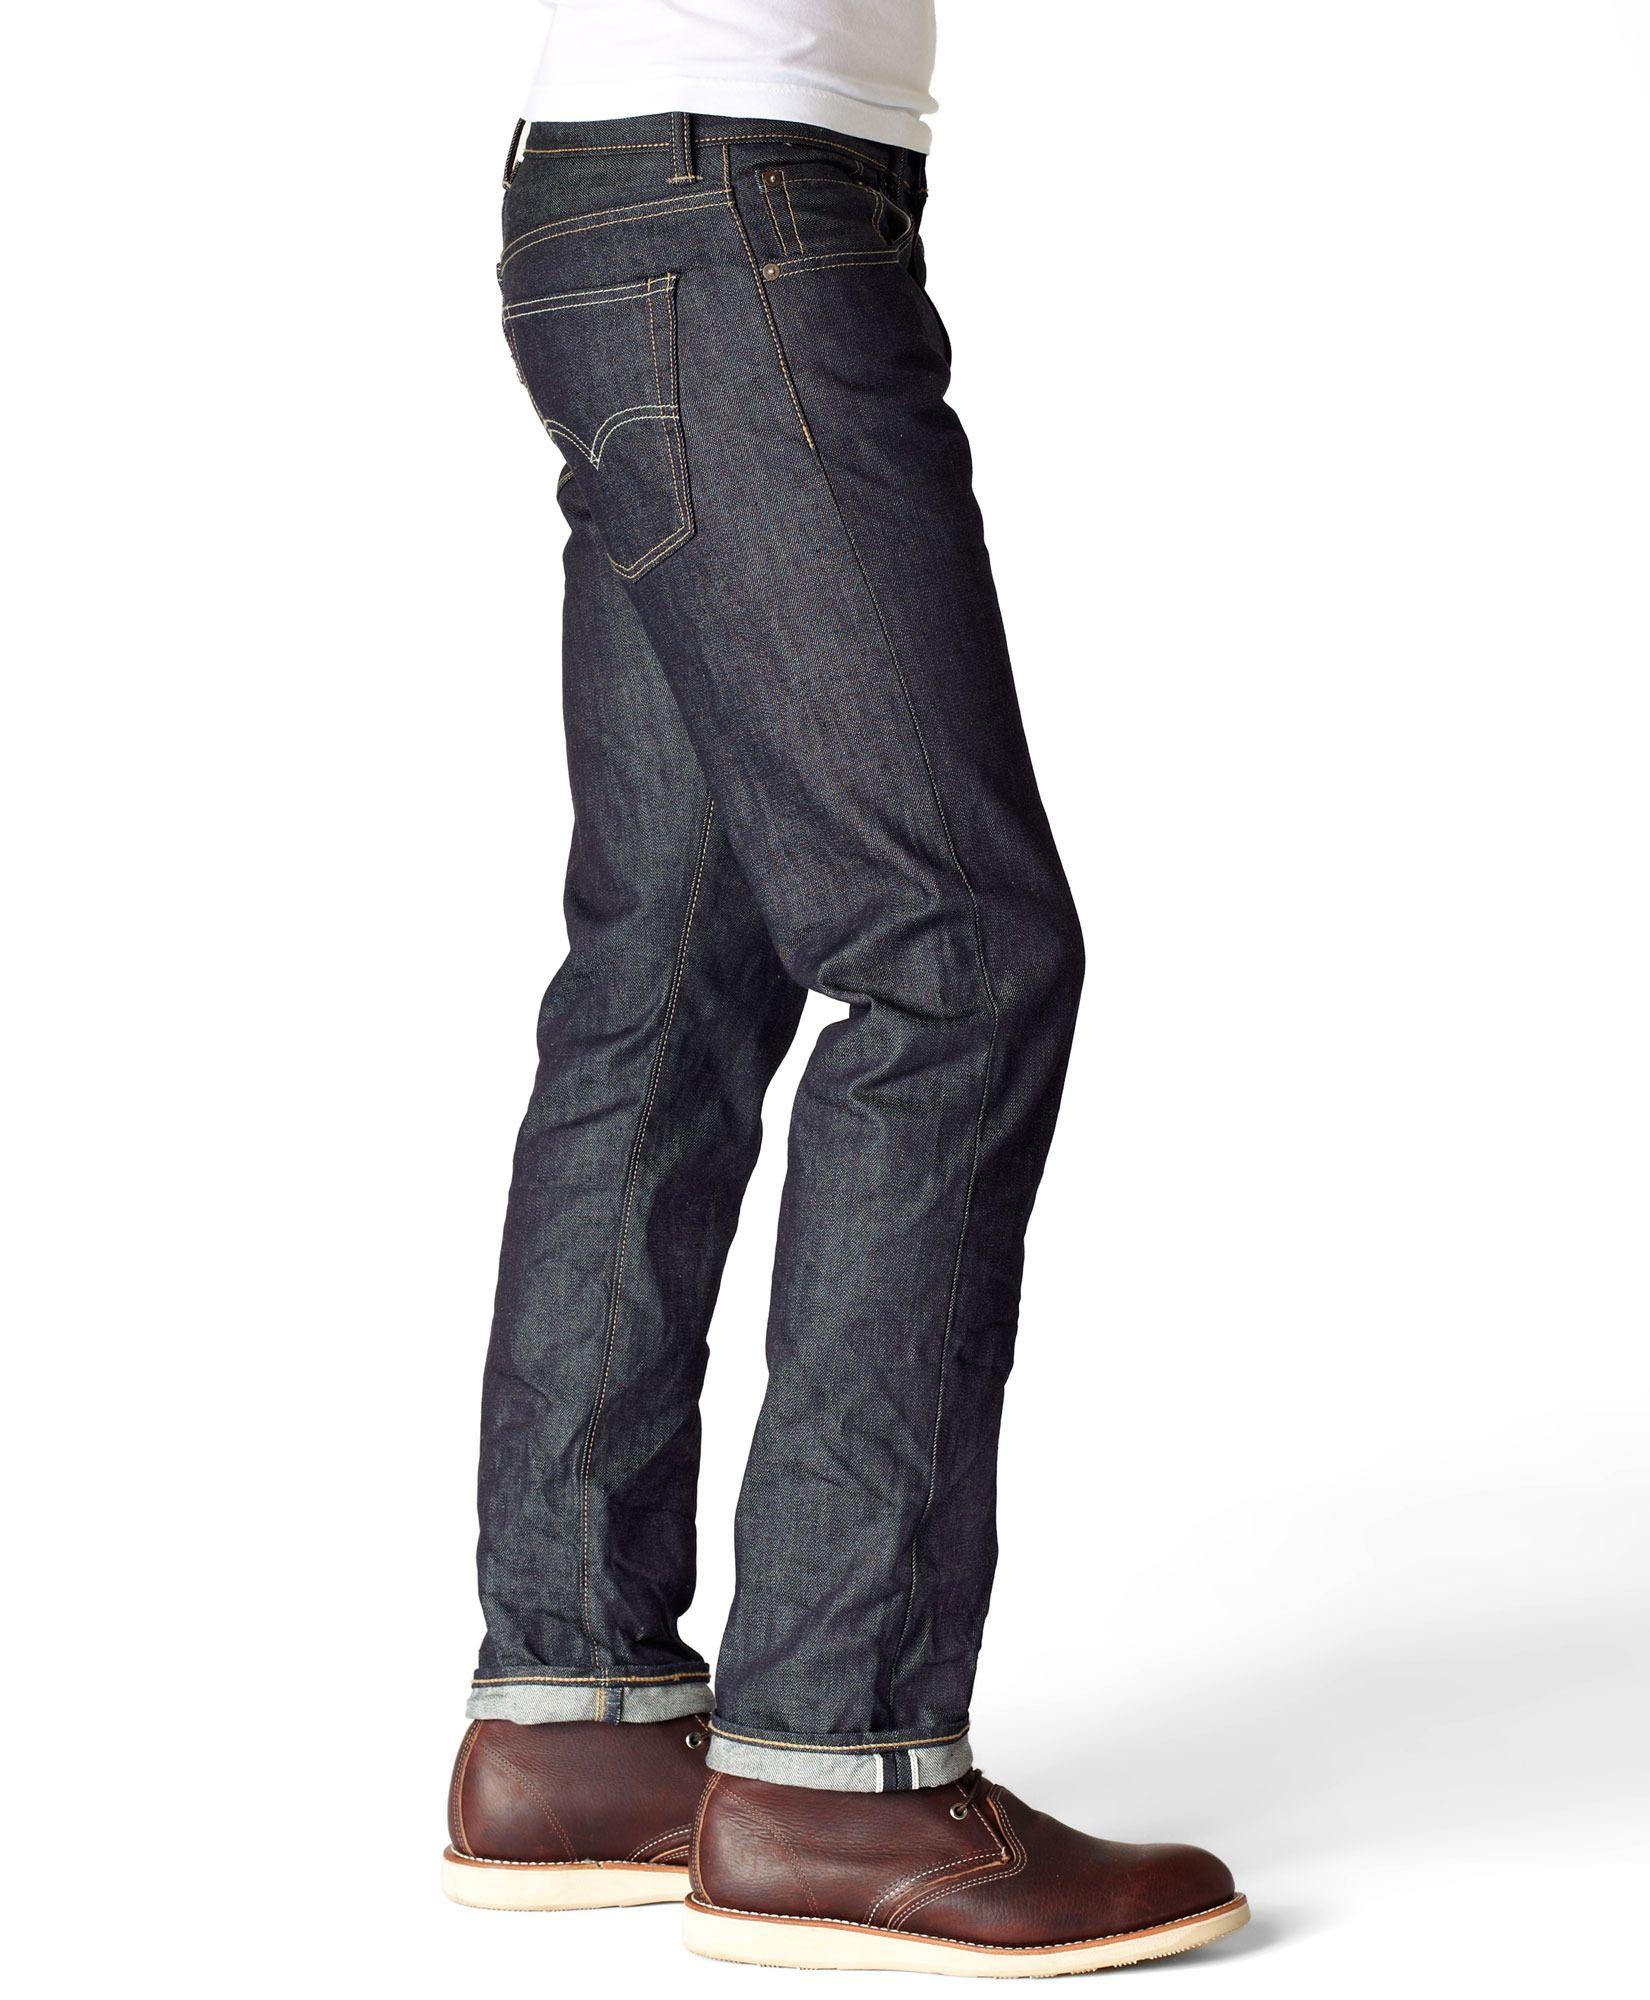 Levis 513 Slim Jeans Cool Outfits For Men Mens Attire Men Casual